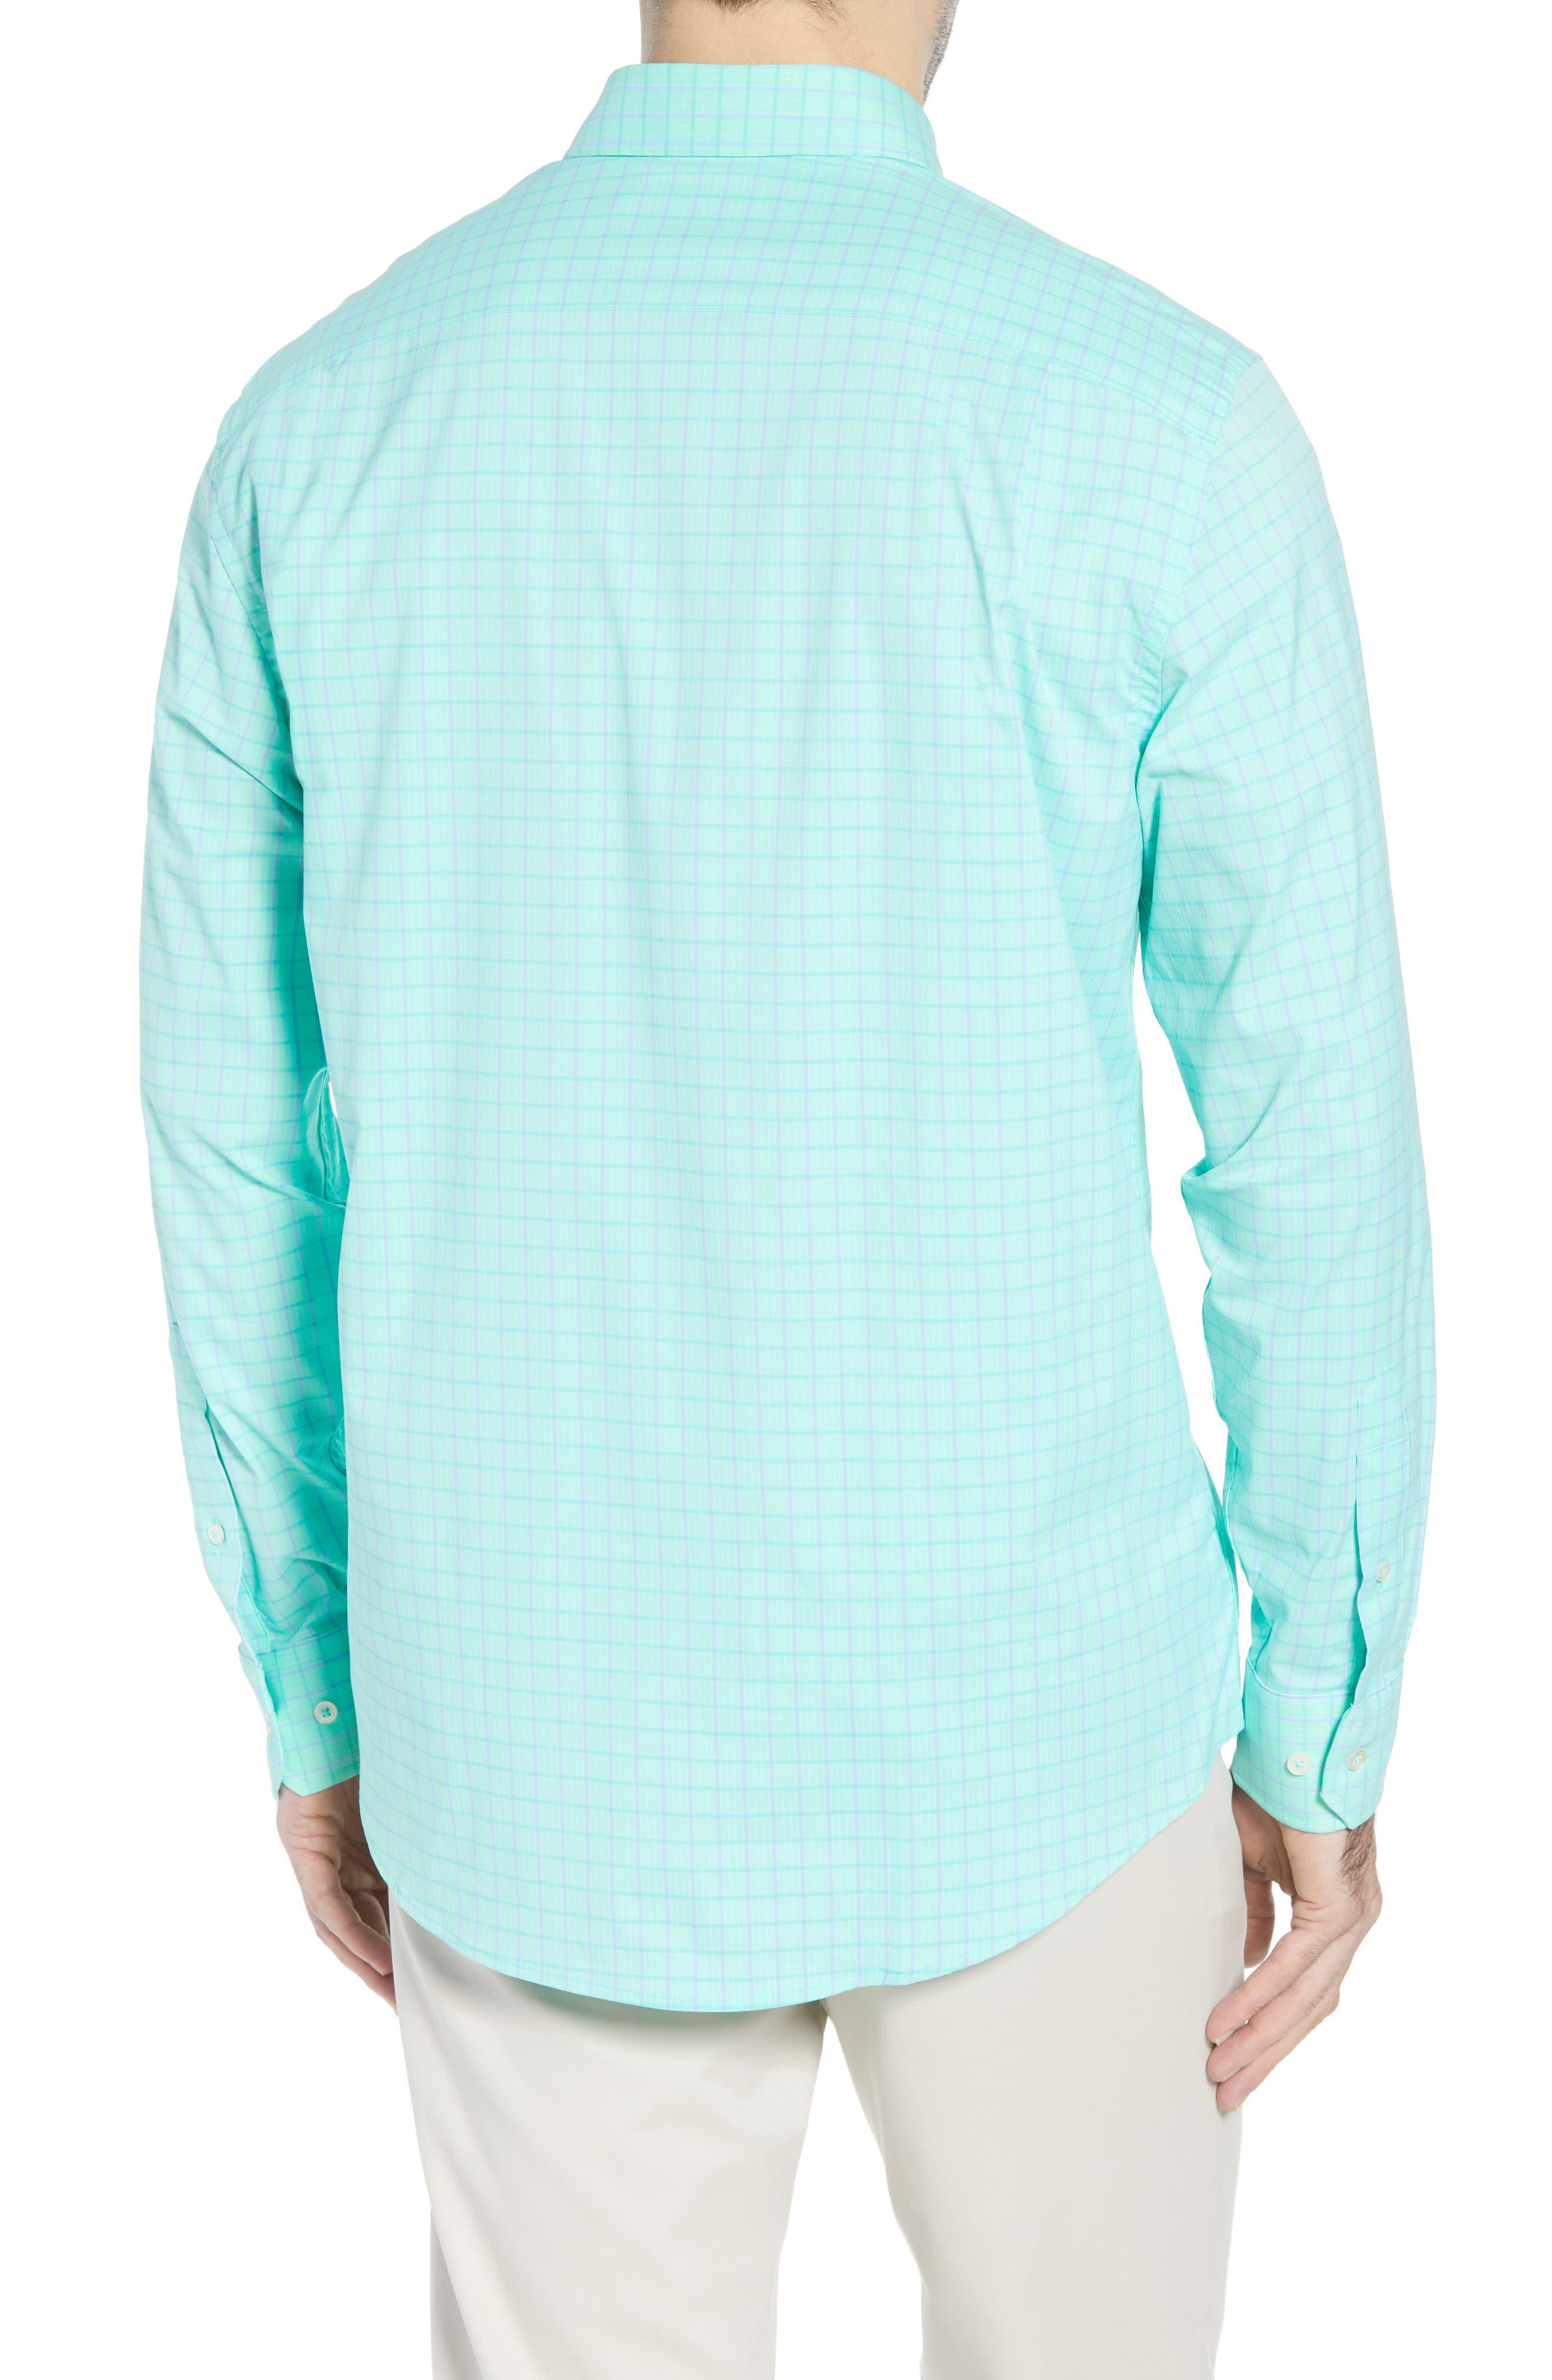 Intercoastal Gordia Plaid Sport Shirt,                             Alternate thumbnail 3, color,                             Sea Foam